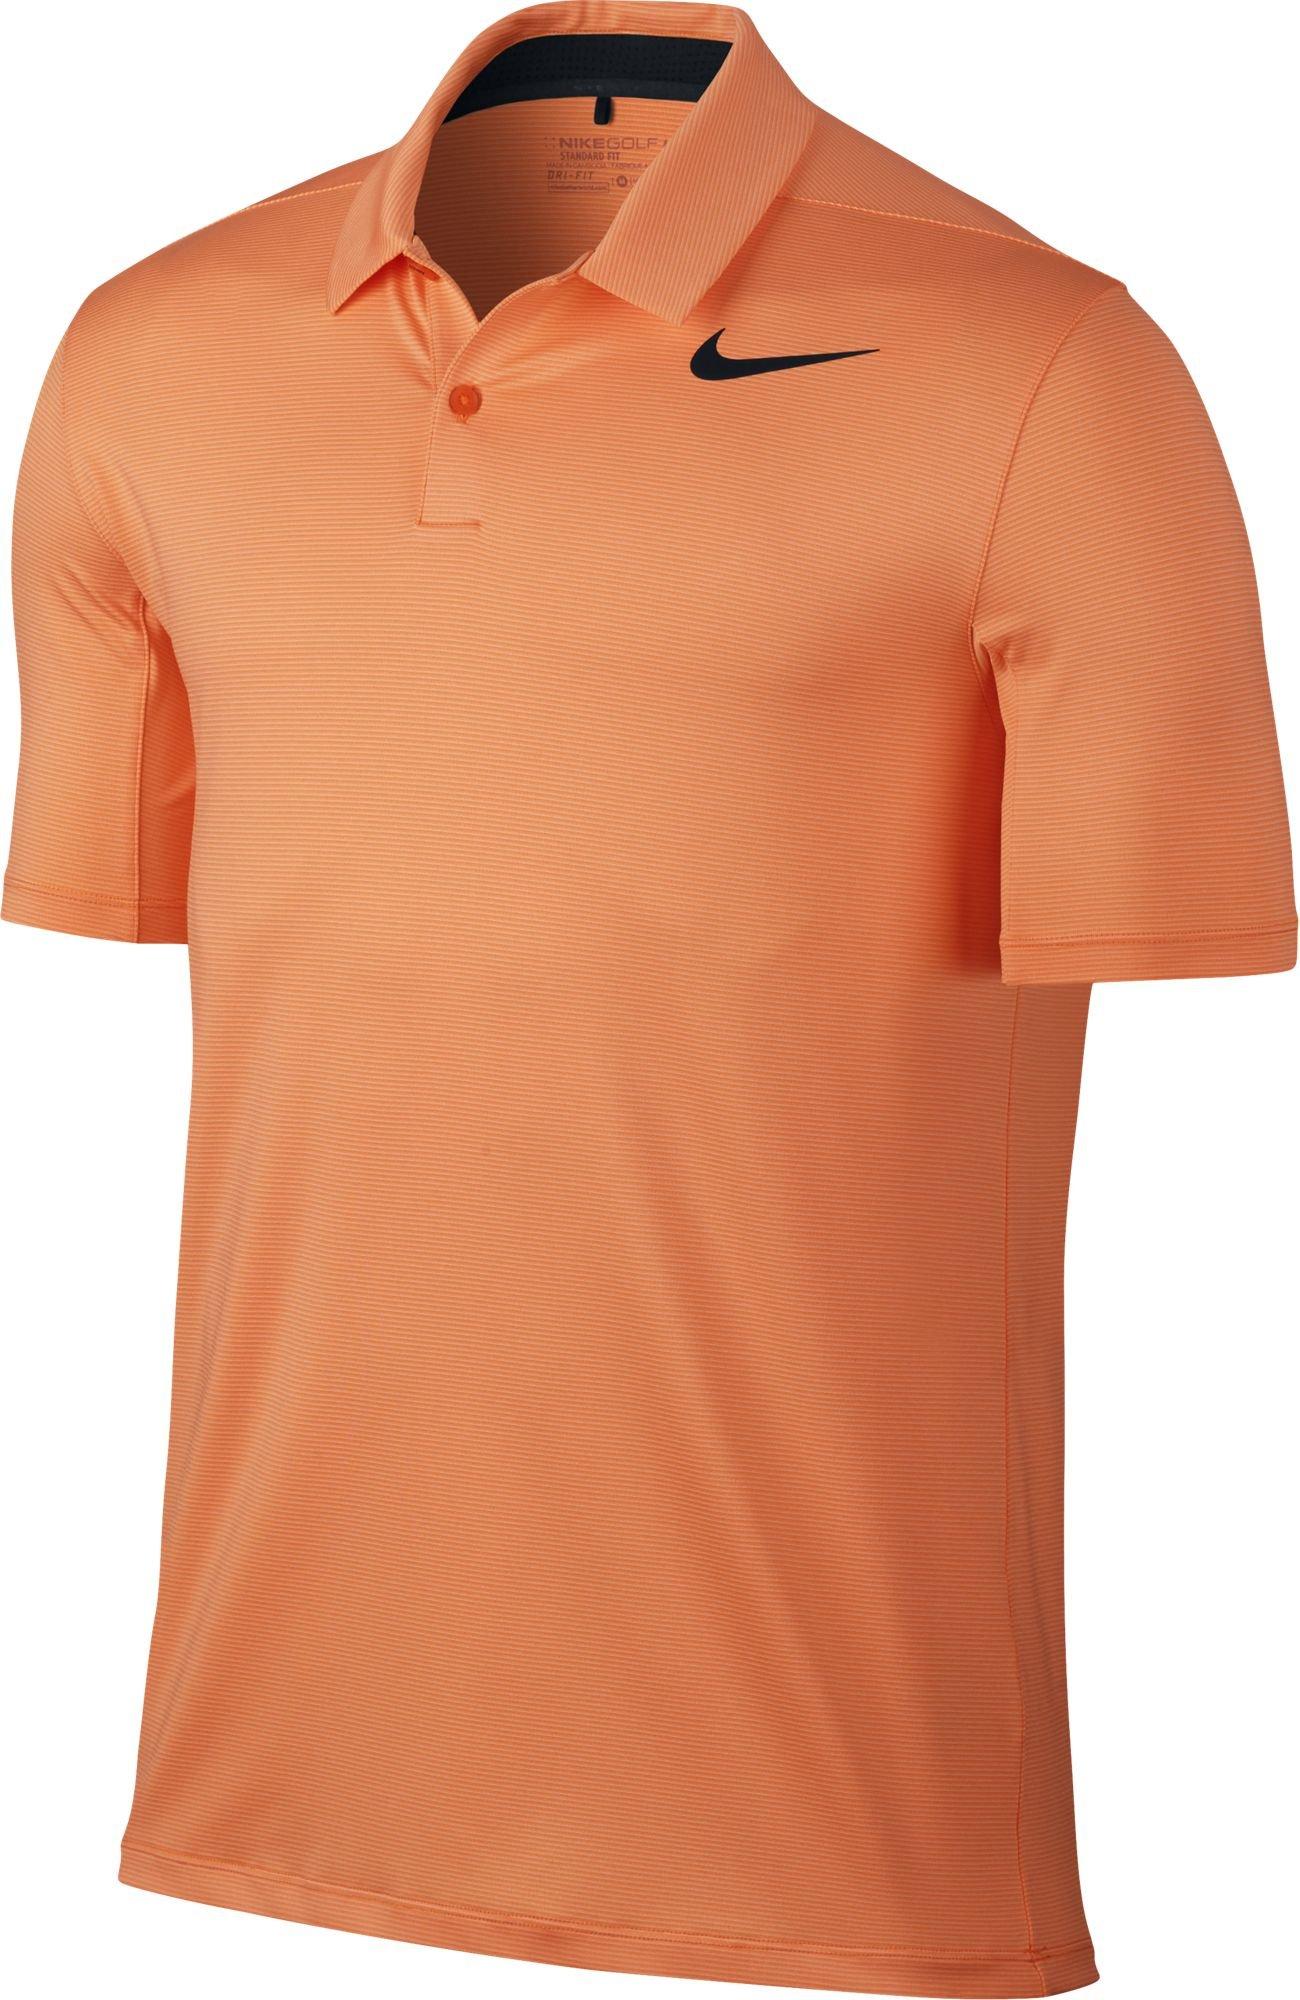 Mens 2017 Nike Dry Control Stripe Golf Polo-833097-856-S